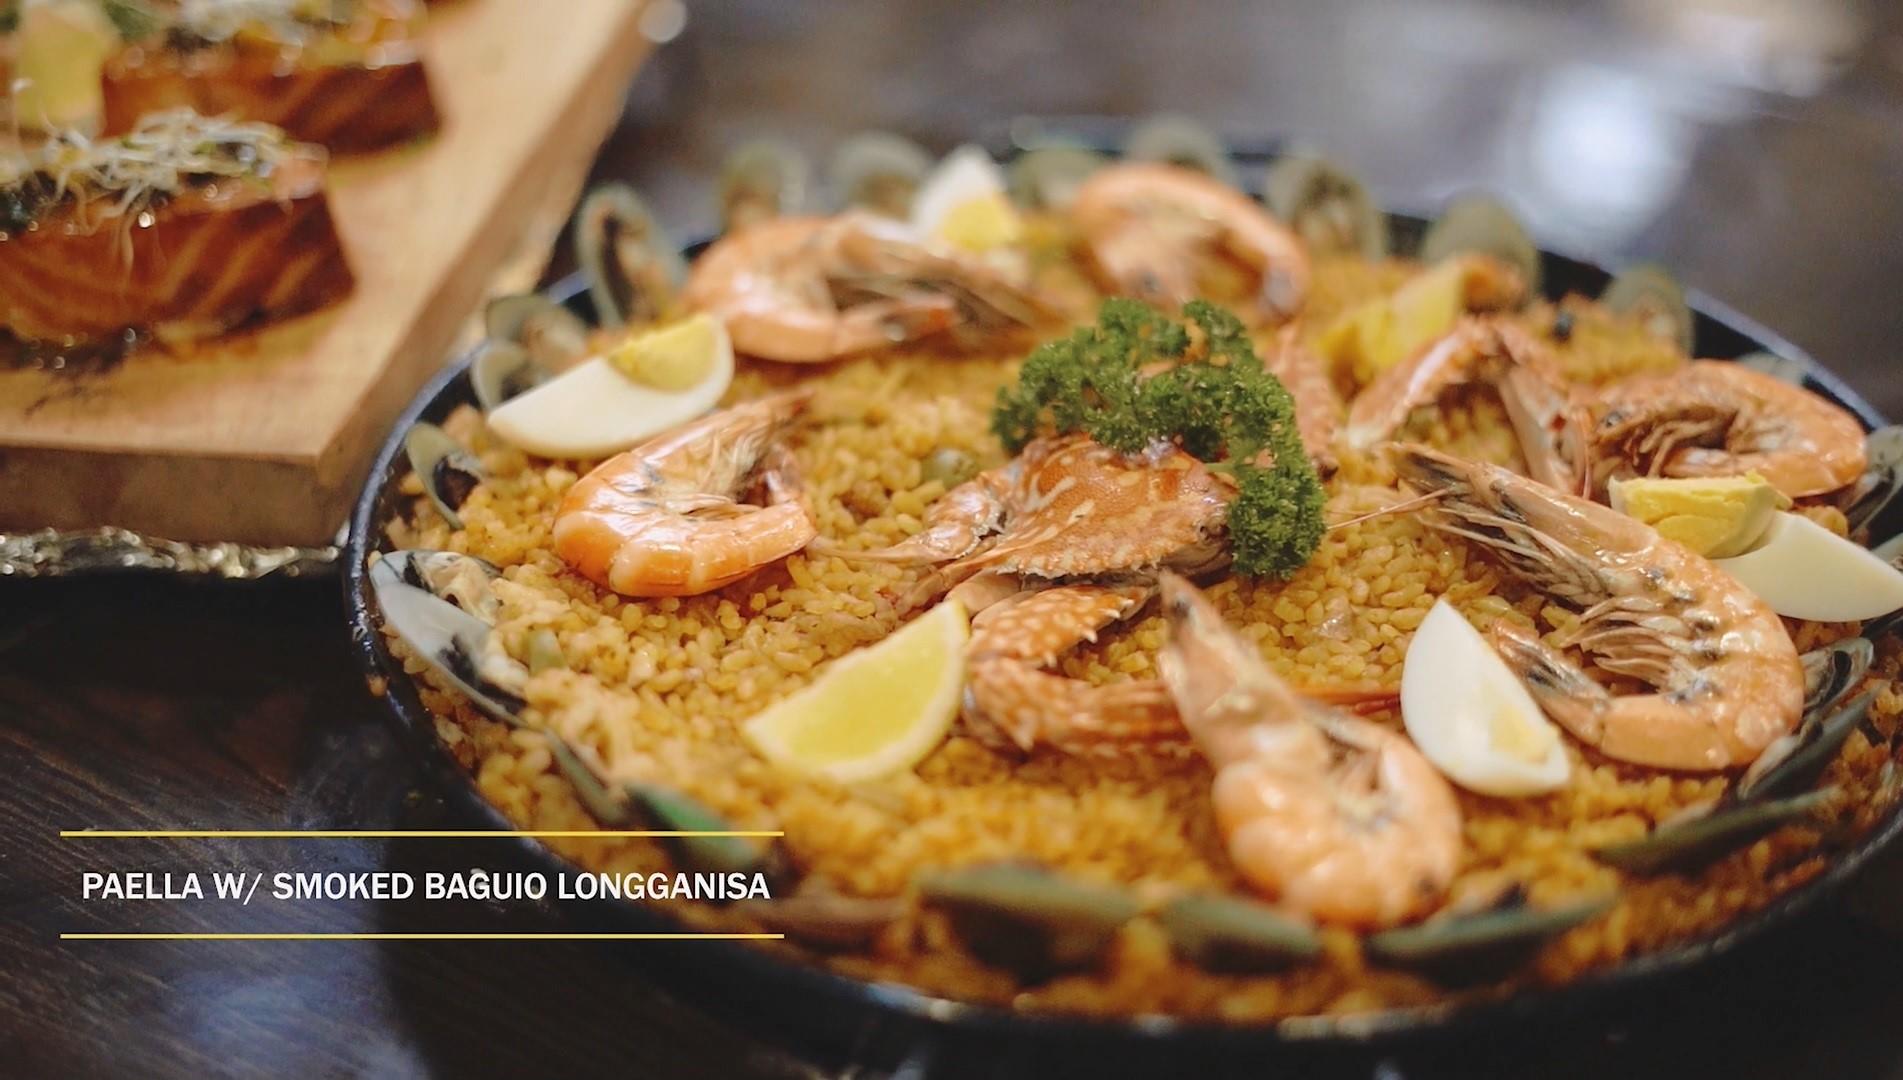 Cordilleran-Spanish fusion lunch at Cocina del sol